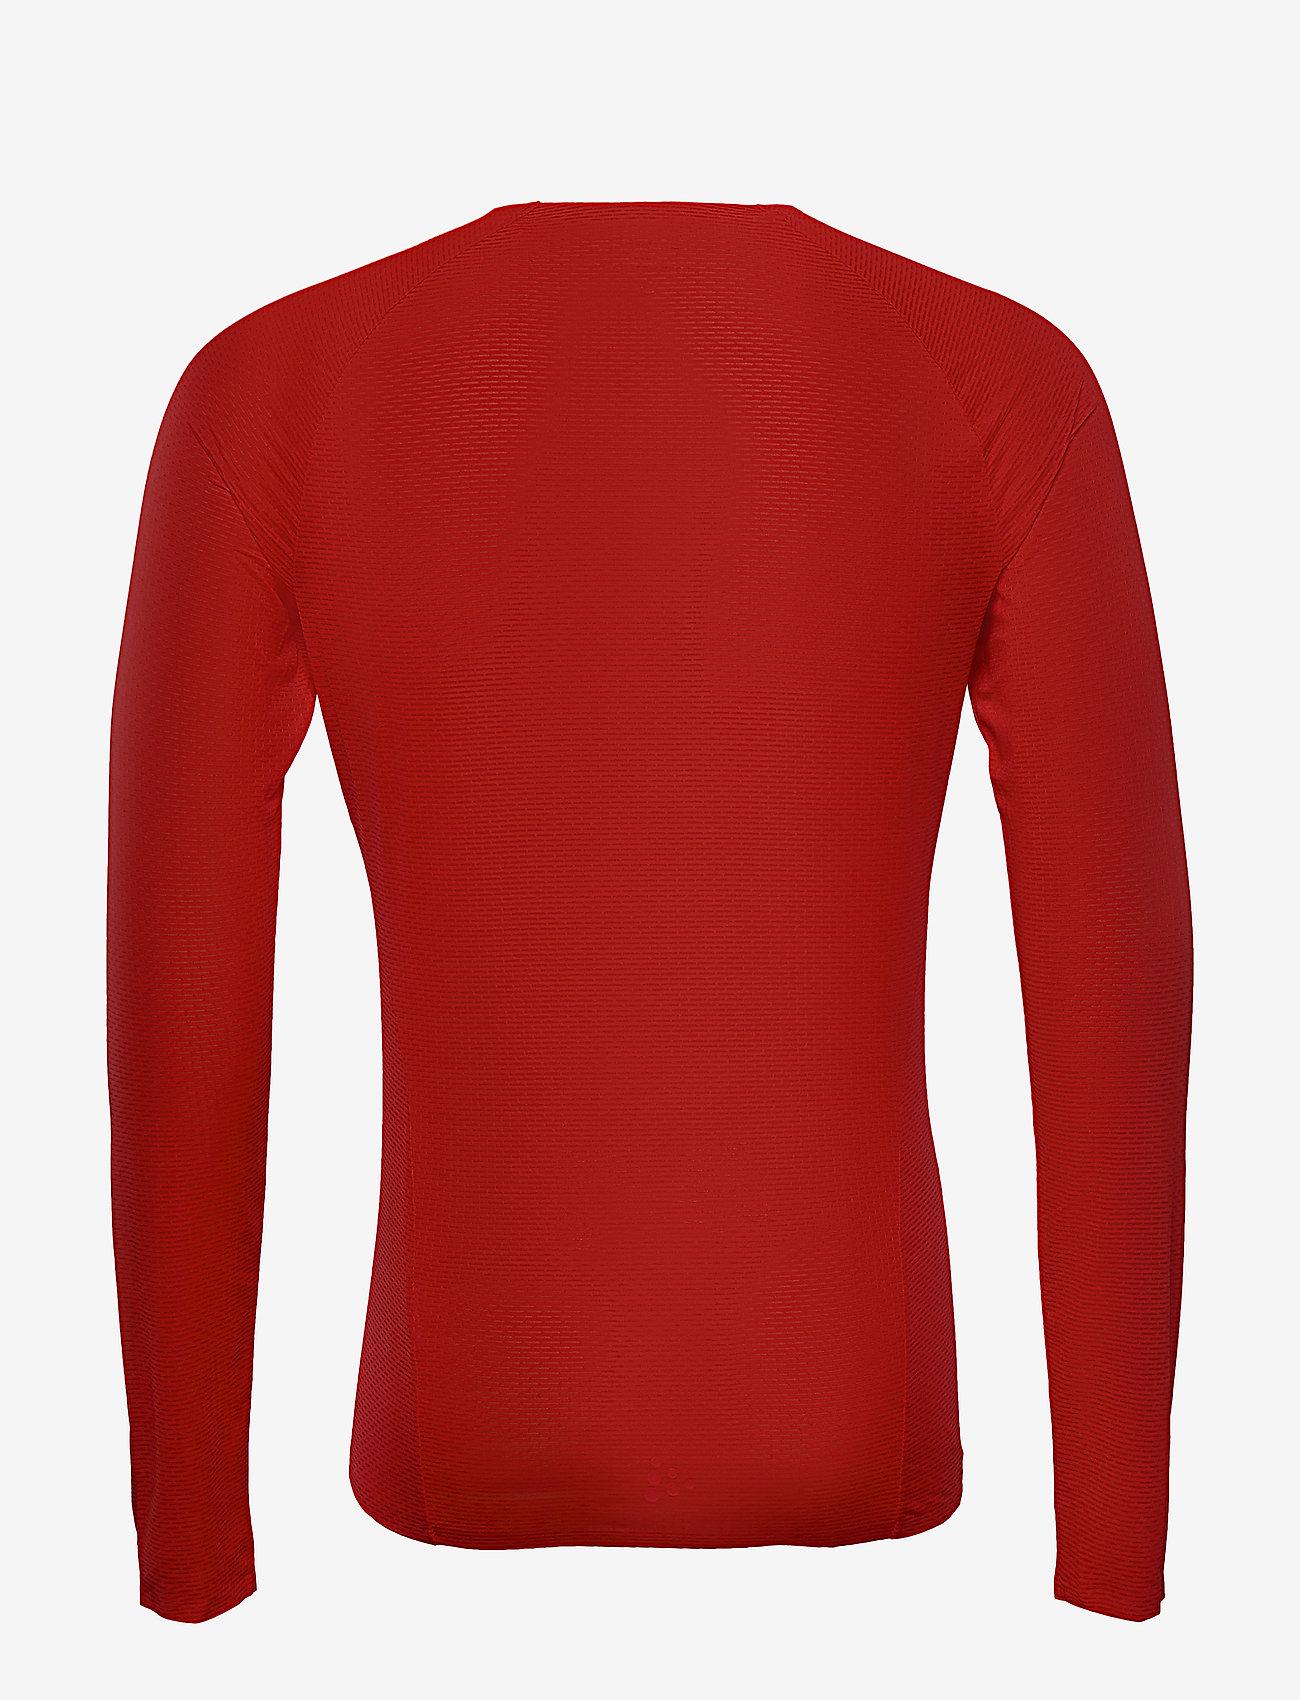 Craft - PRO DRY NANOWEIGHT LS M - longsleeved tops - bright red